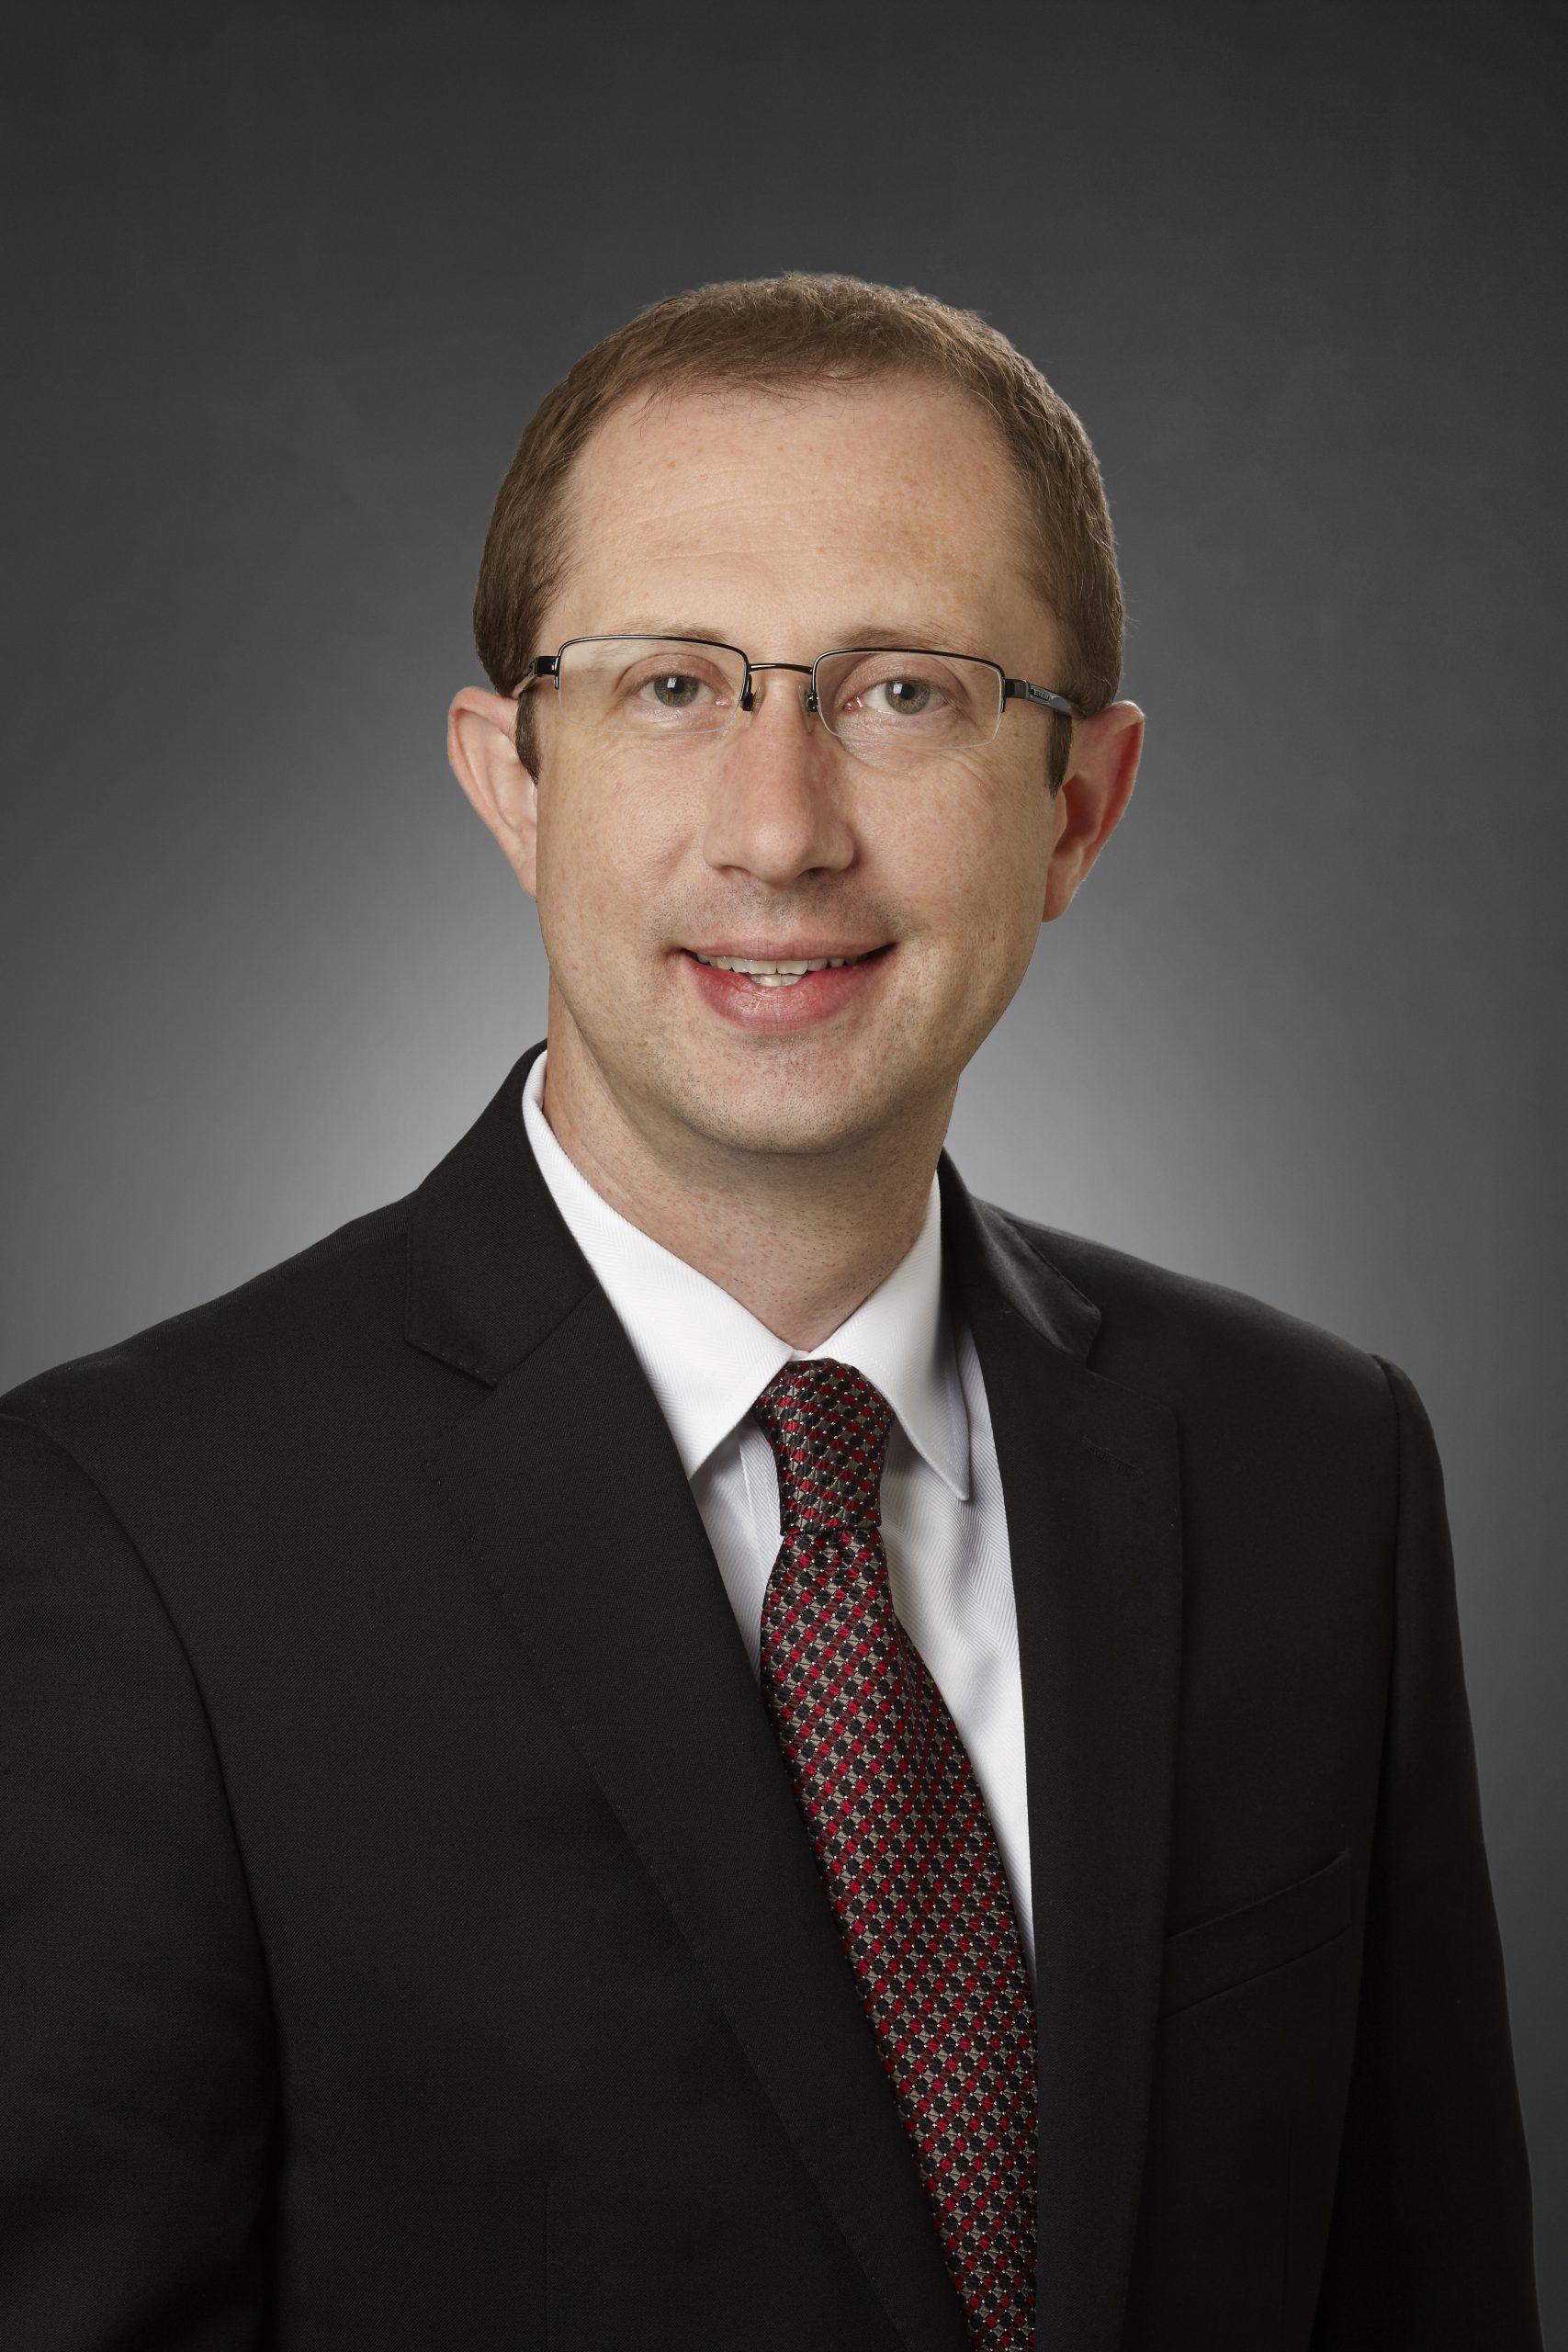 John Weimer, MS, RN, AEMT, CEN, NEA-BC, FACHE